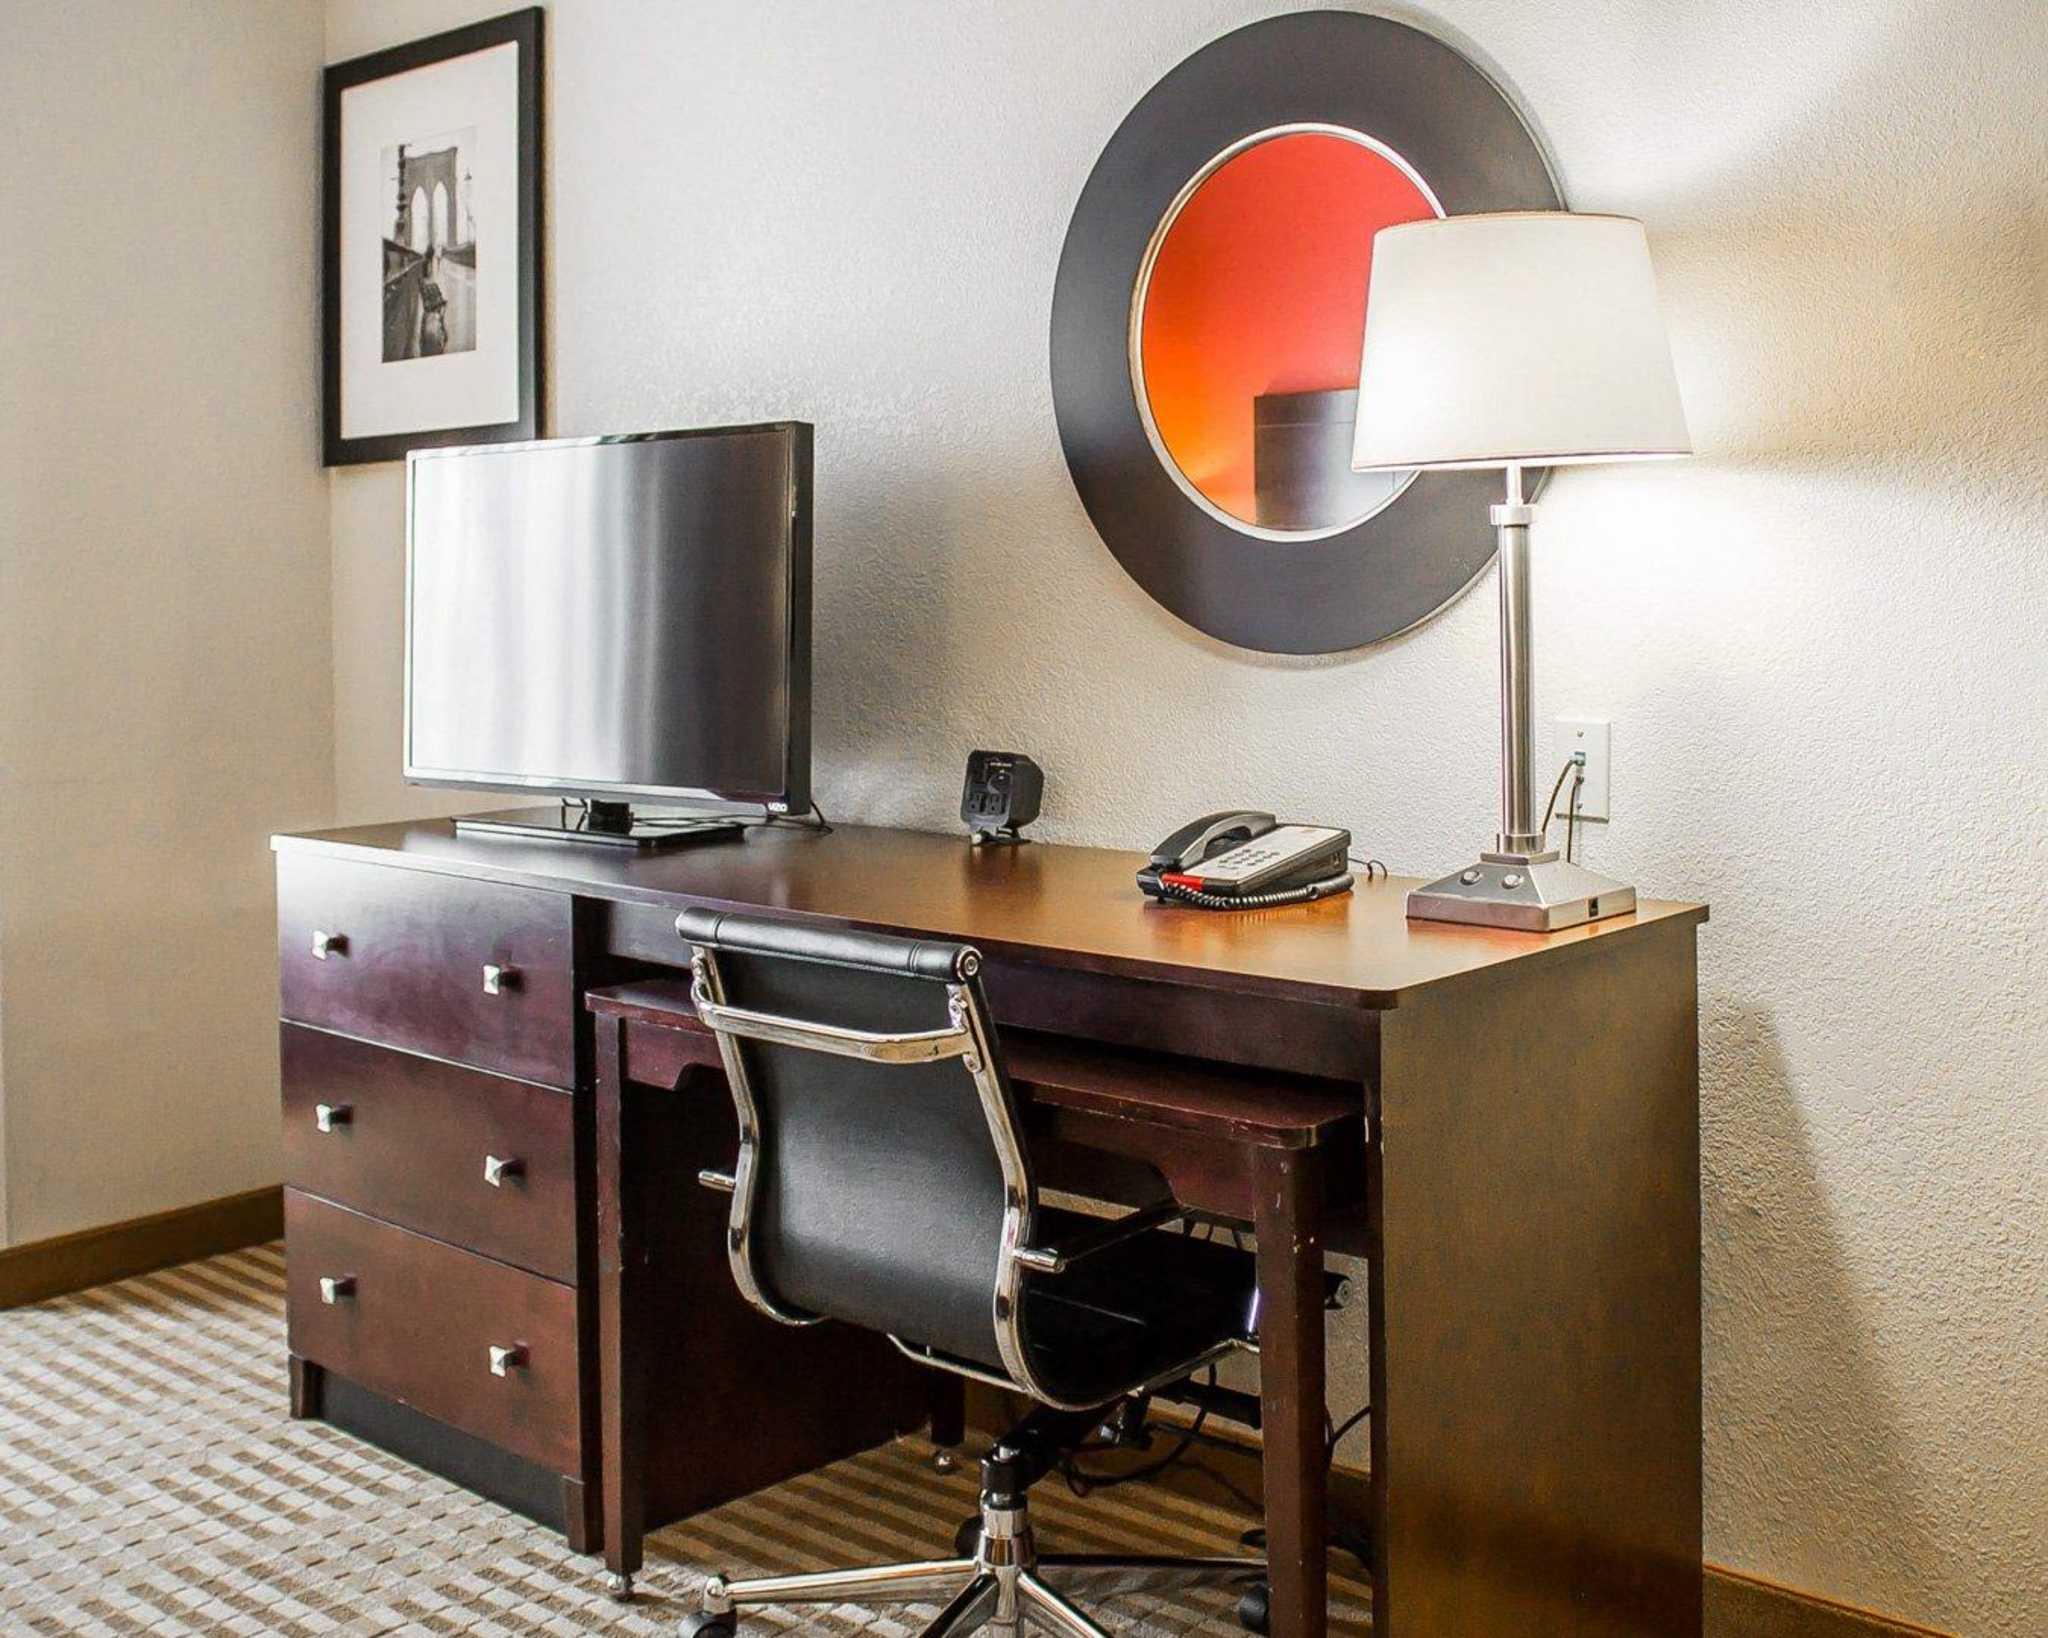 Comfort Suites East Broad at 270 image 10